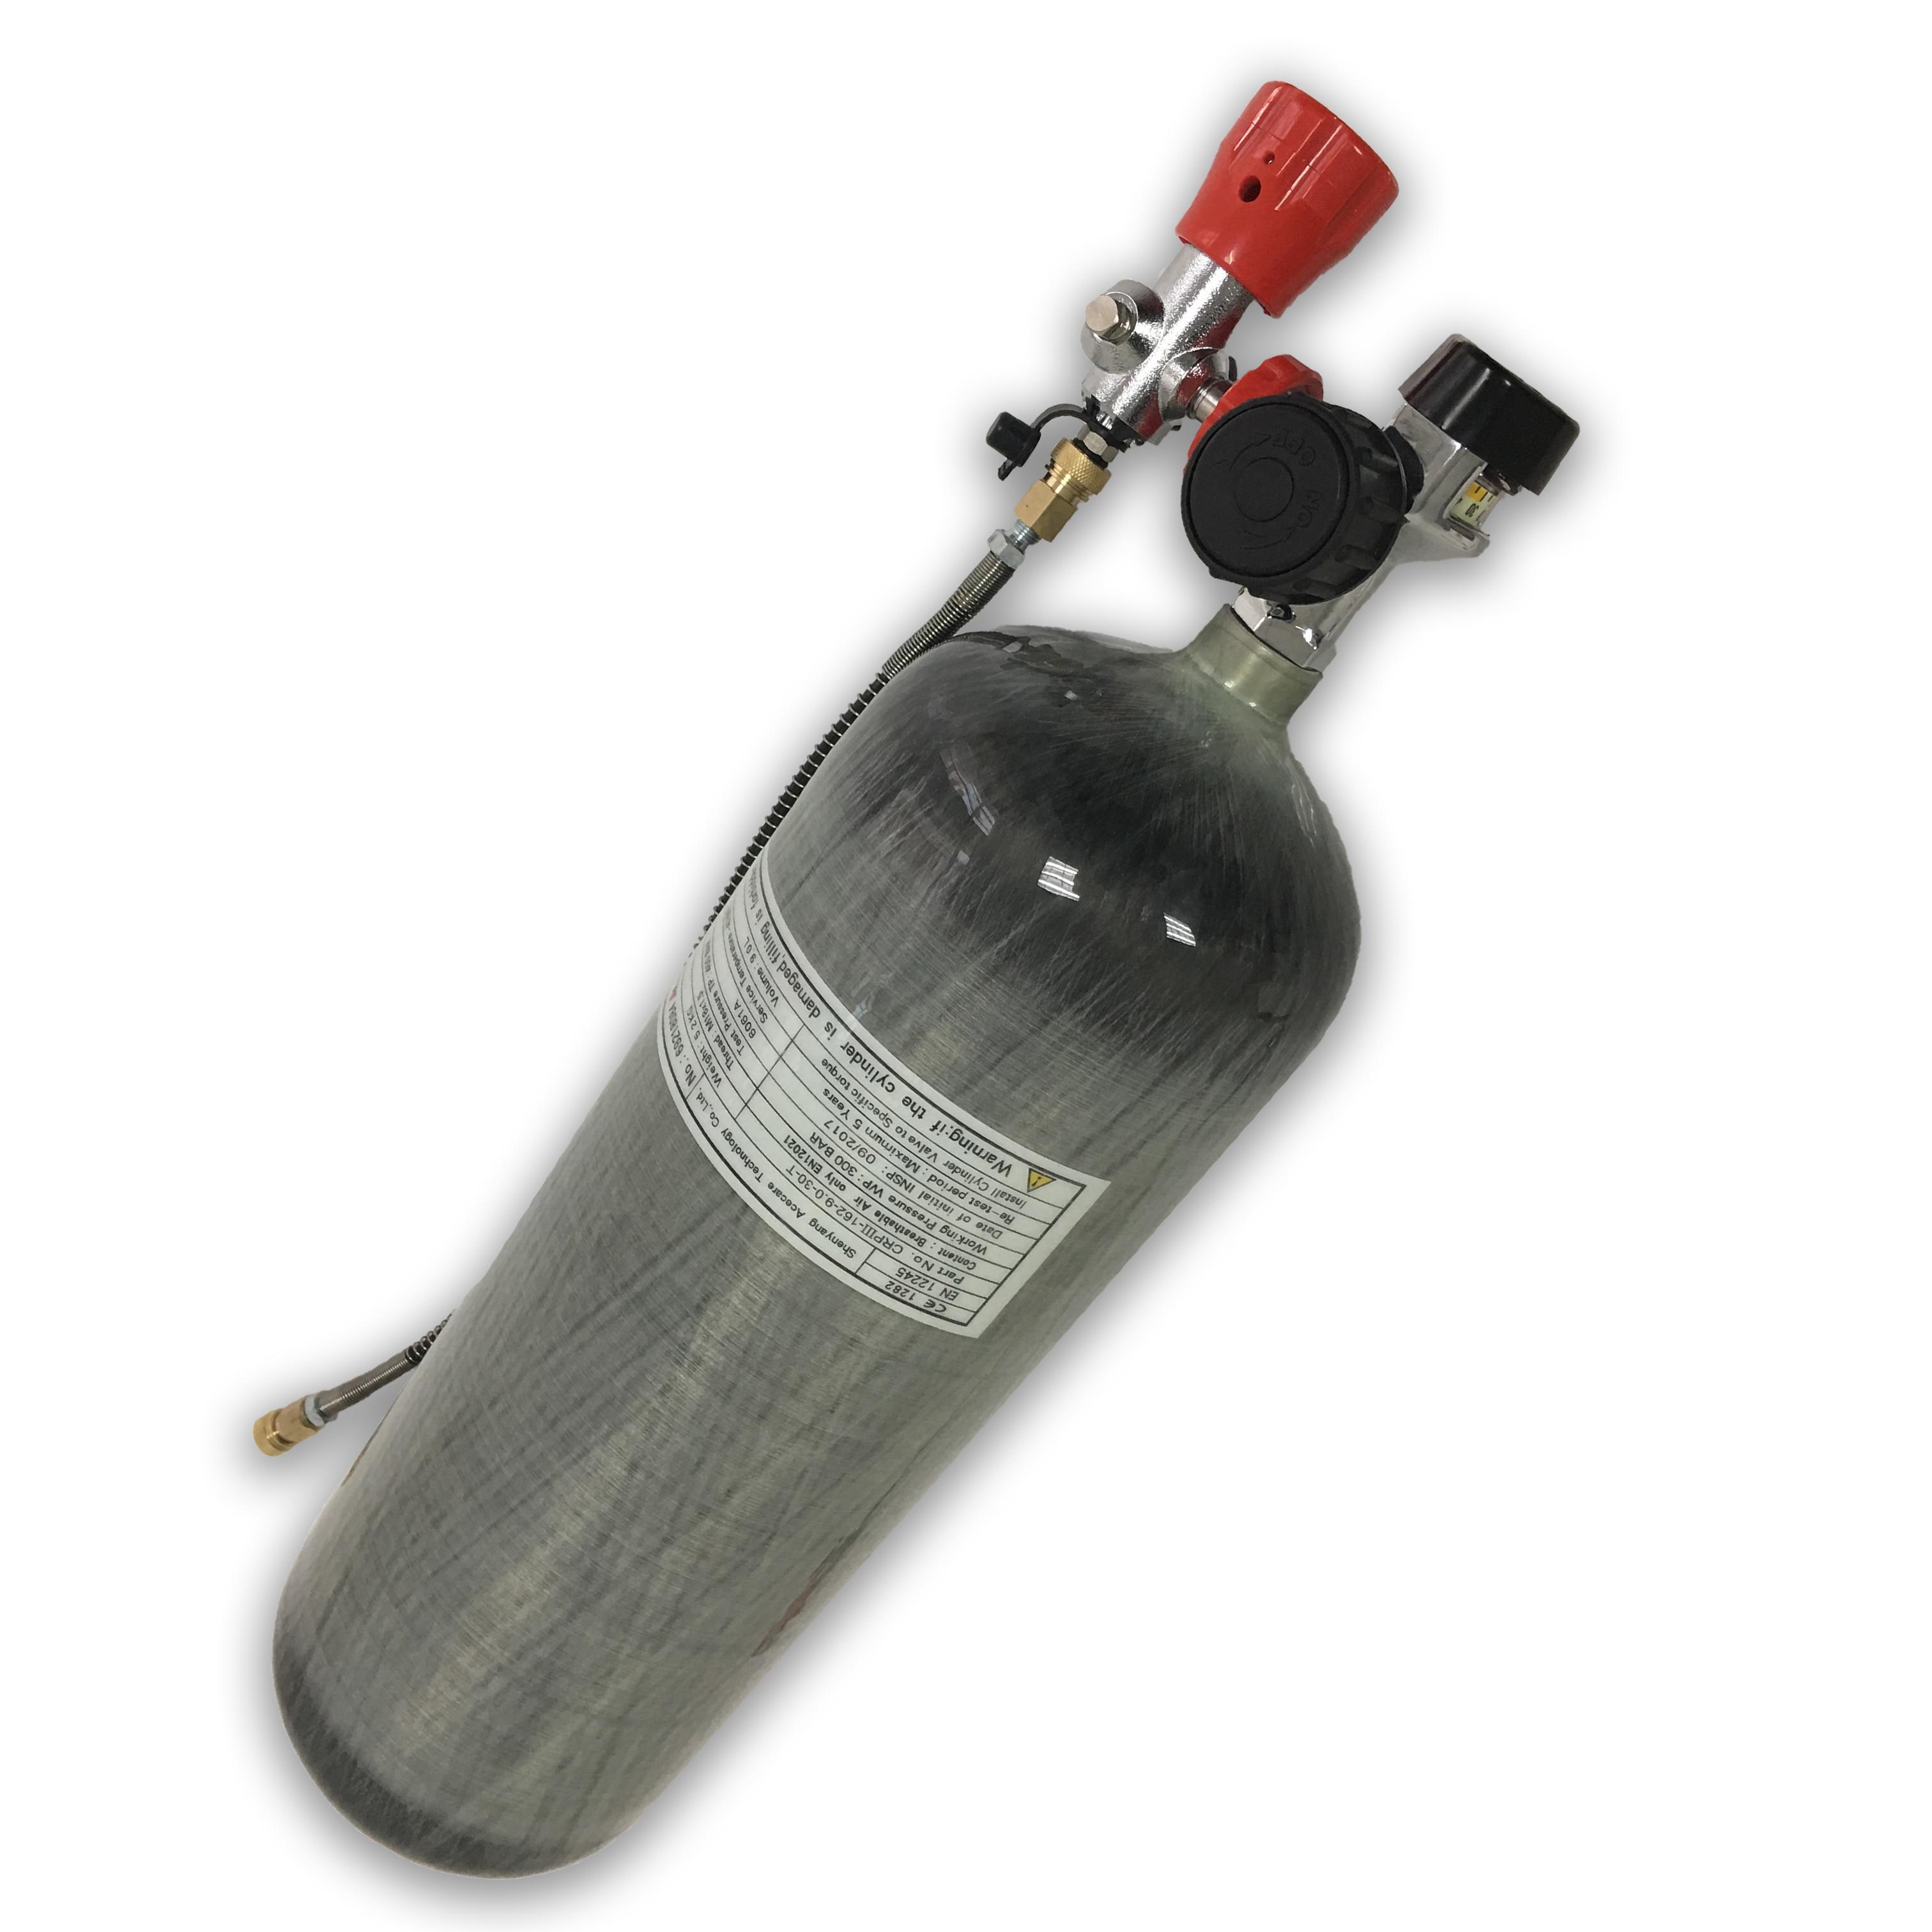 AC109201 Scuba Pcp Aluminum Oxygen Tank 9L 30Mpa  High Pressure Cylinder Carbon Fiber Valve Scuba Diving Cylinder Pcp Air Rifle